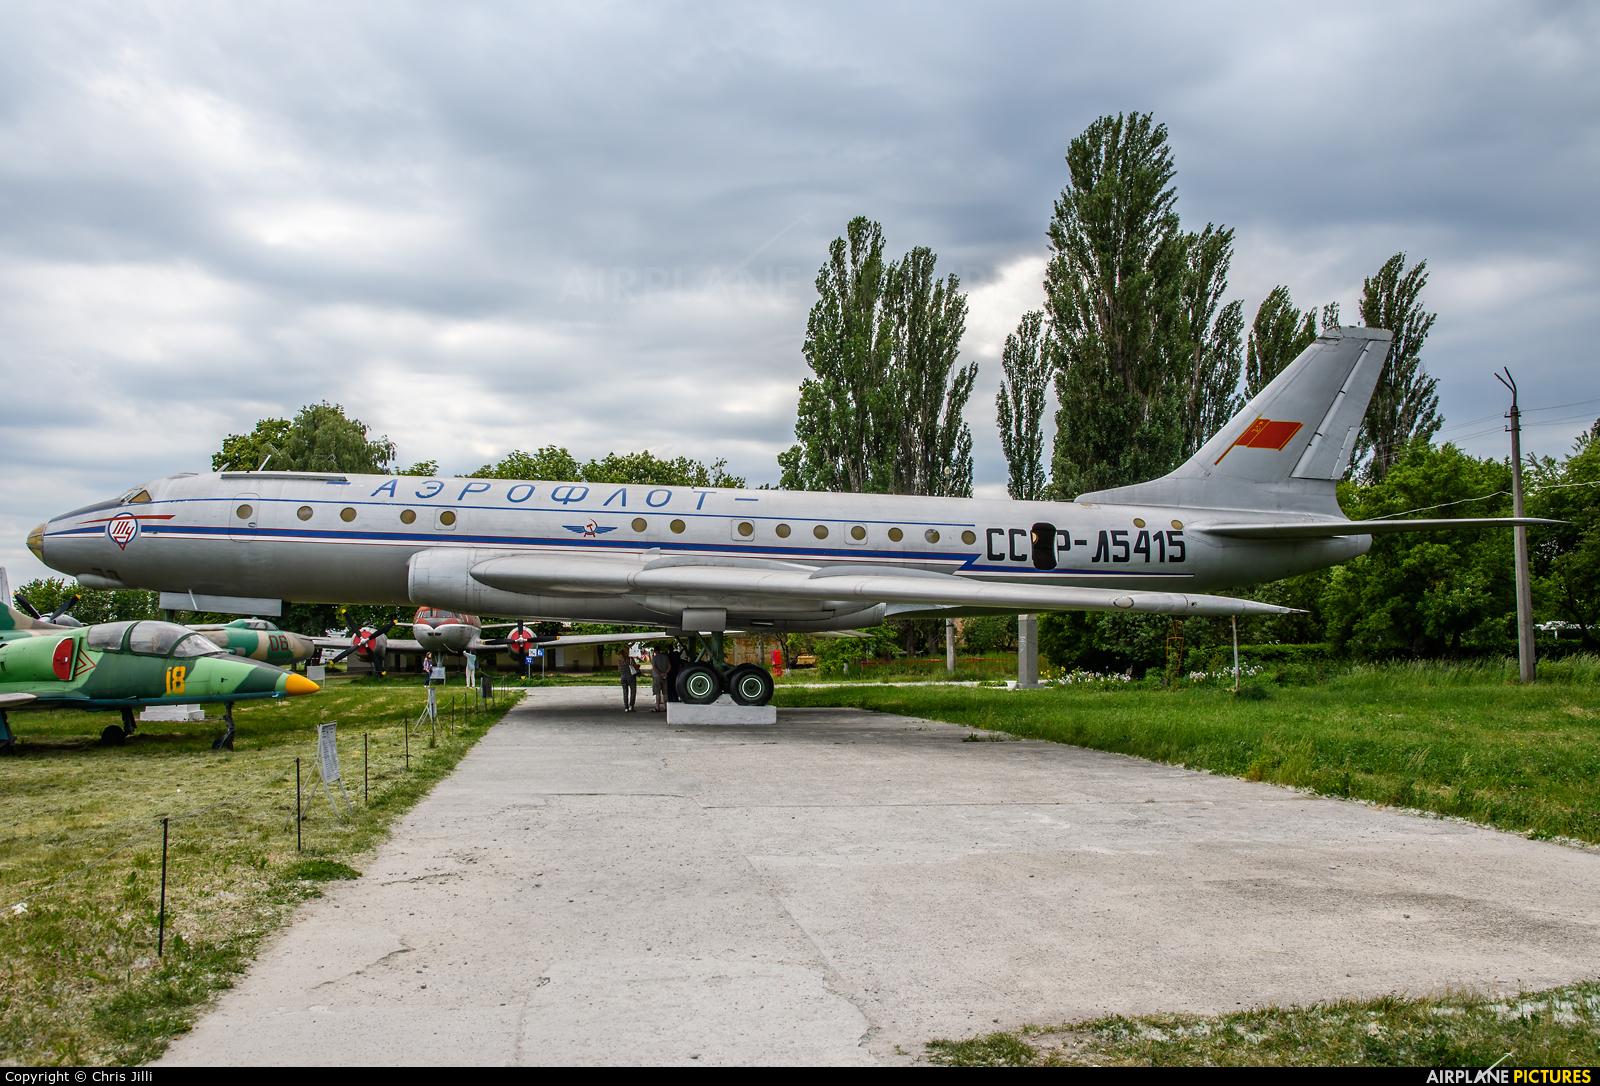 Aeroflot CCCP-L5415 aircraft at Kiev - Zhulyany